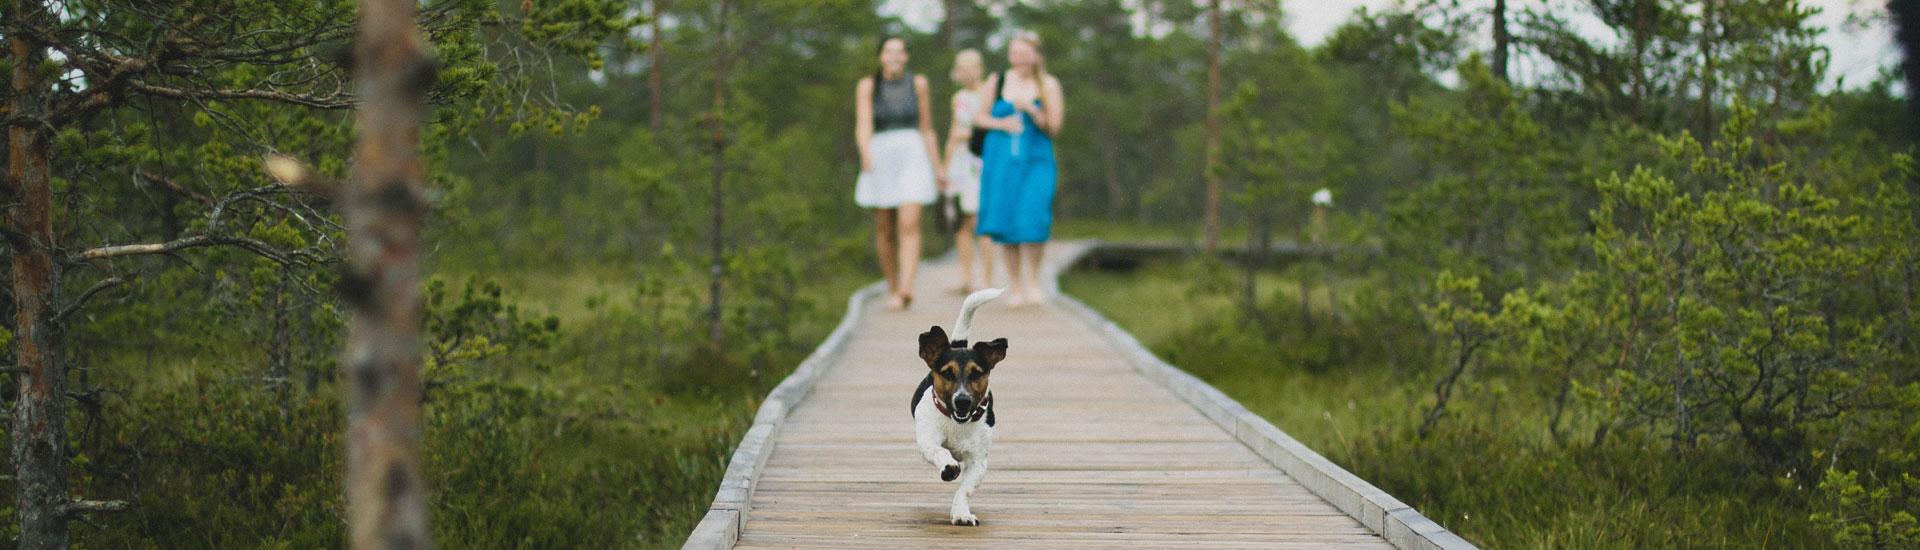 Animal Nerd - Dog Walk